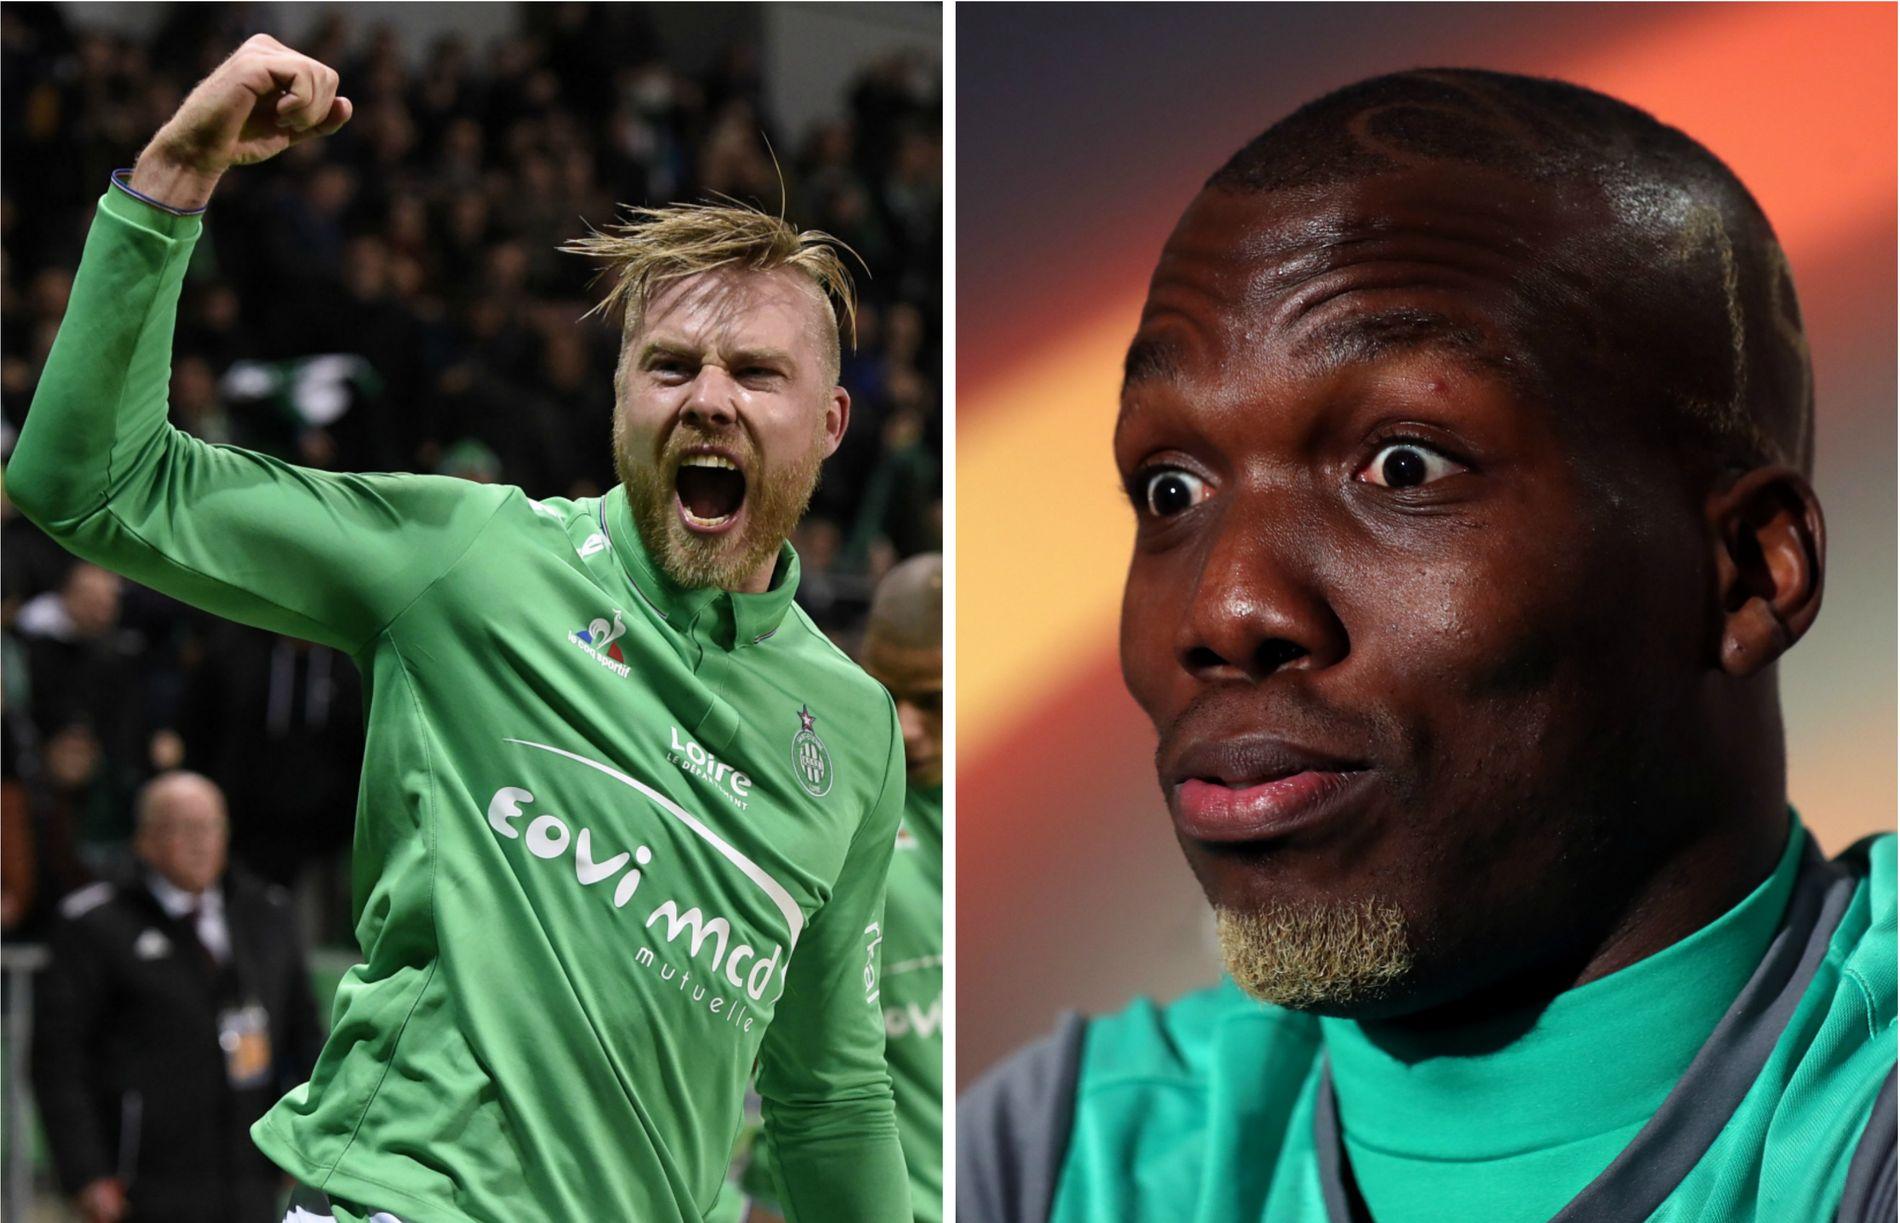 MISTER UNITED-KAMP: Alexander Søderlund (t.v.) er skadet og mister kampen mot Manchester United. Det synes Florentin Pogba, her under onsdagens pressekonferanse, er synd.